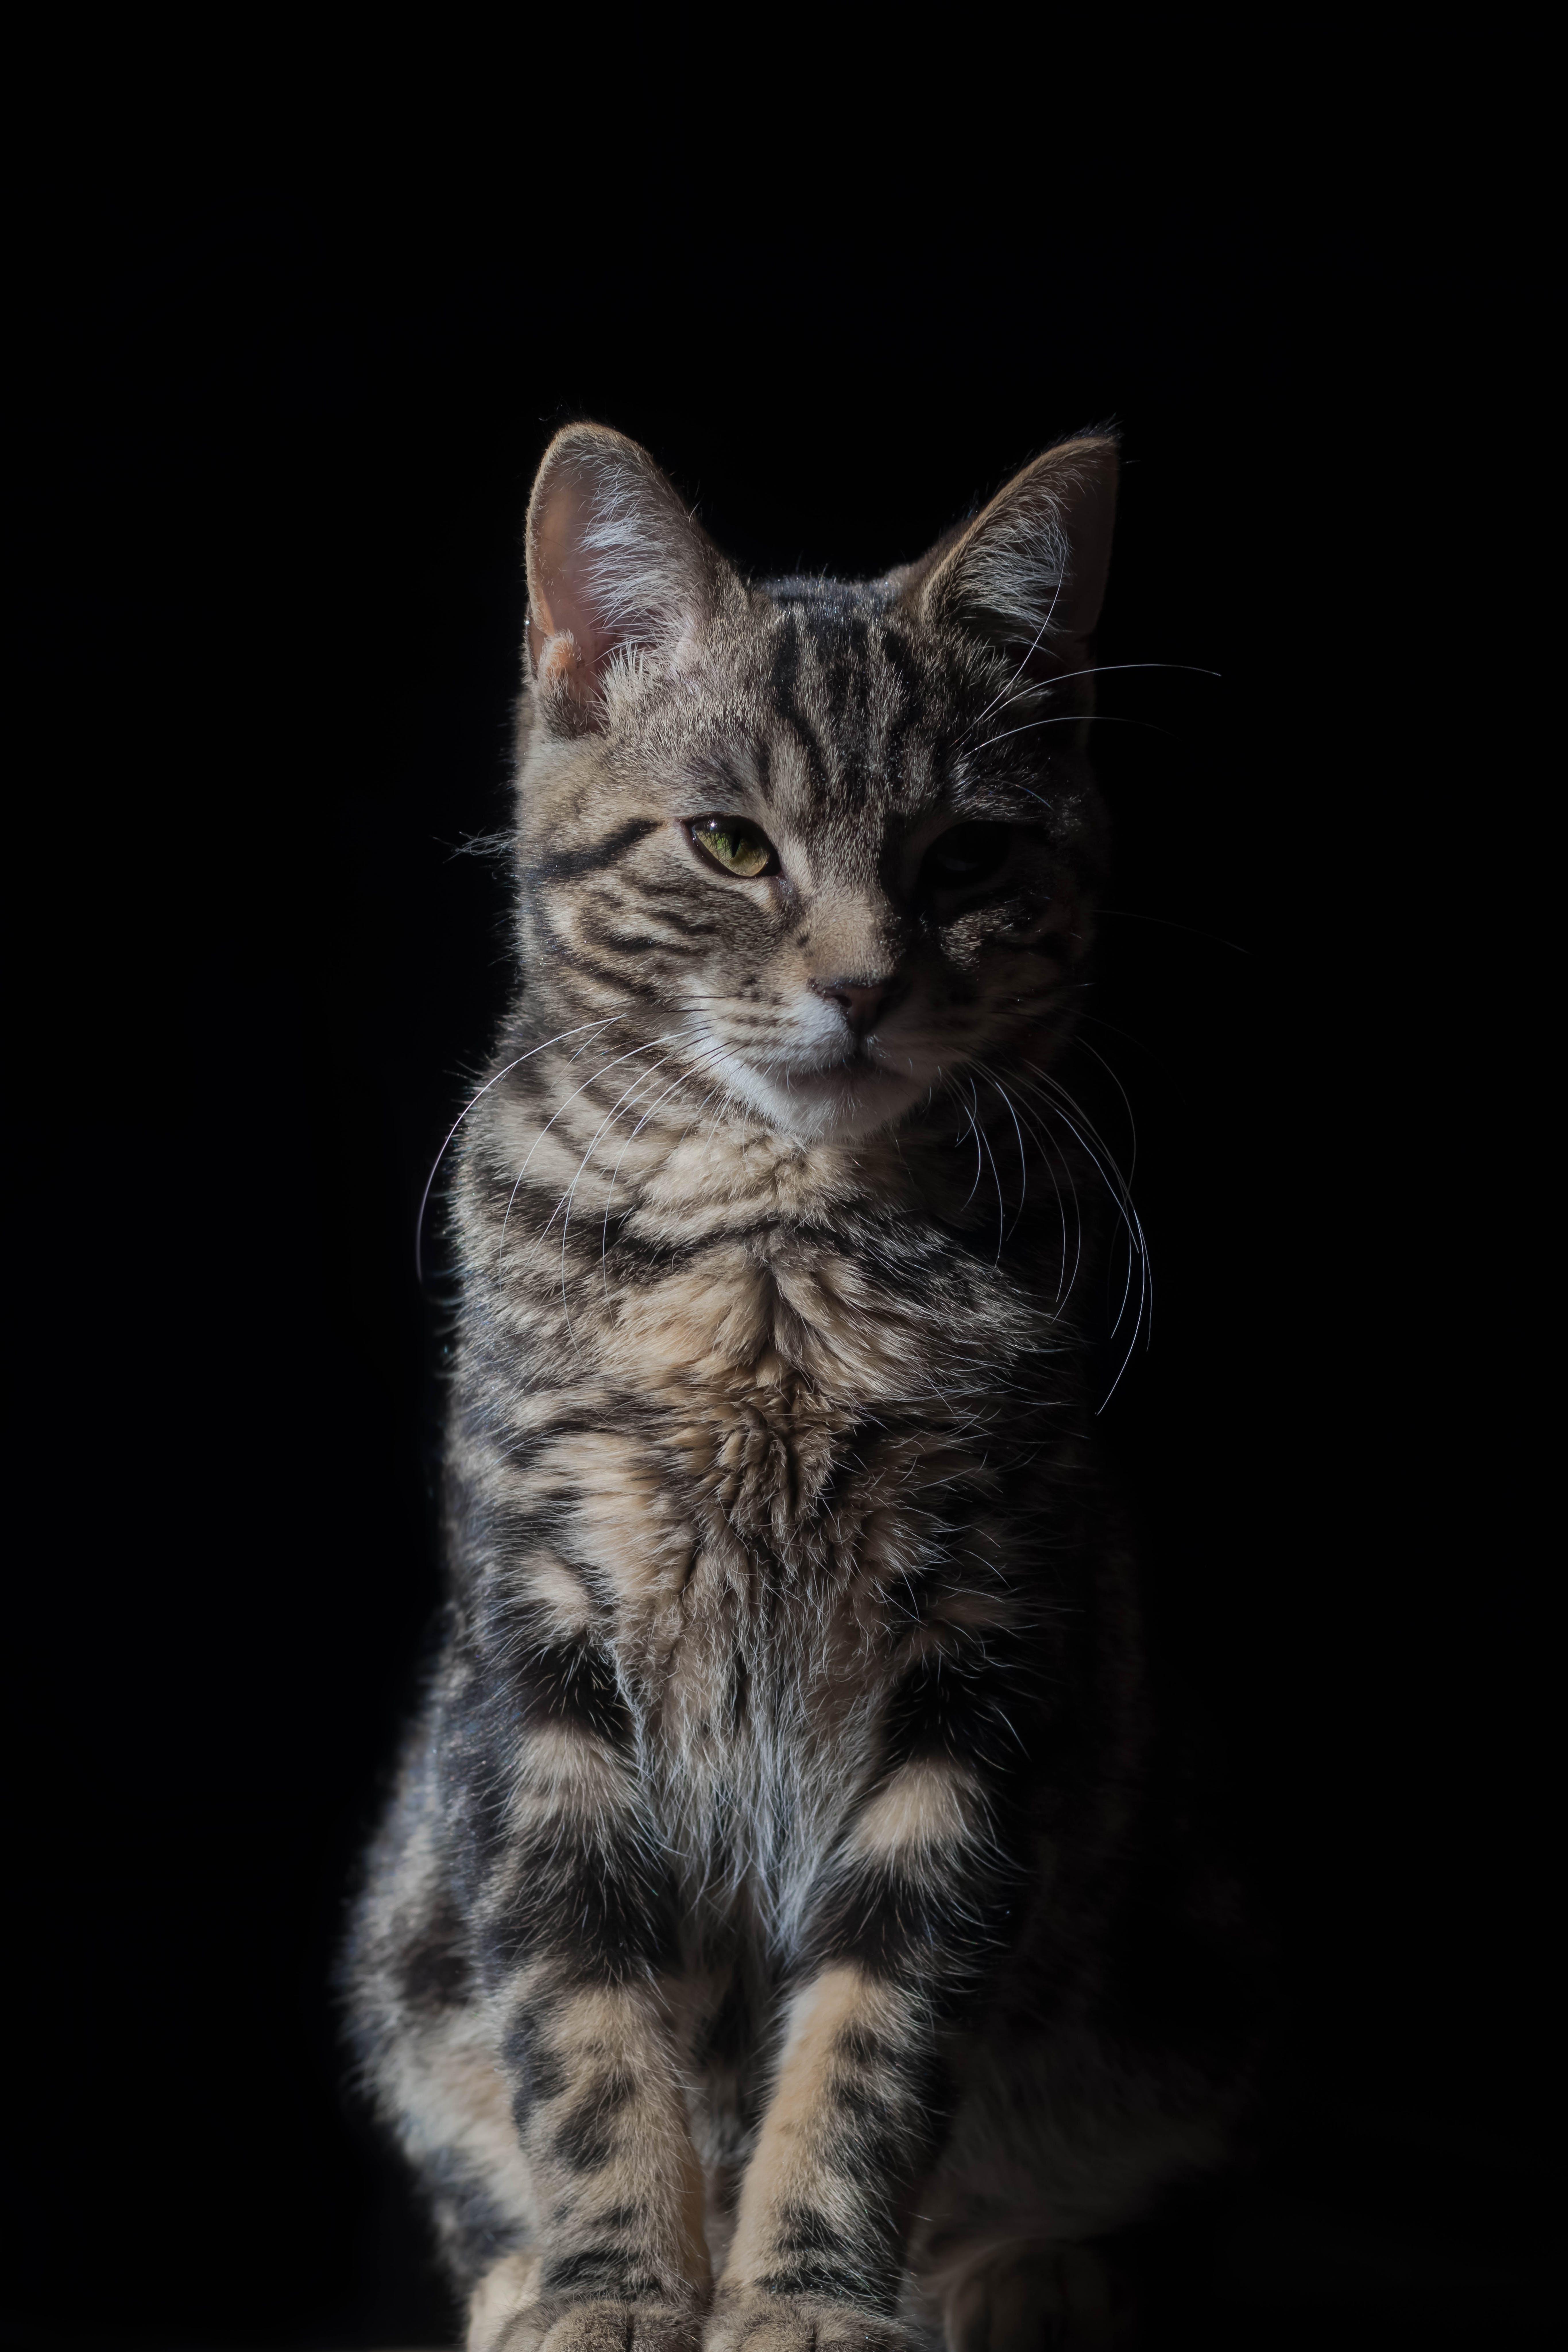 Cat Against Black Background